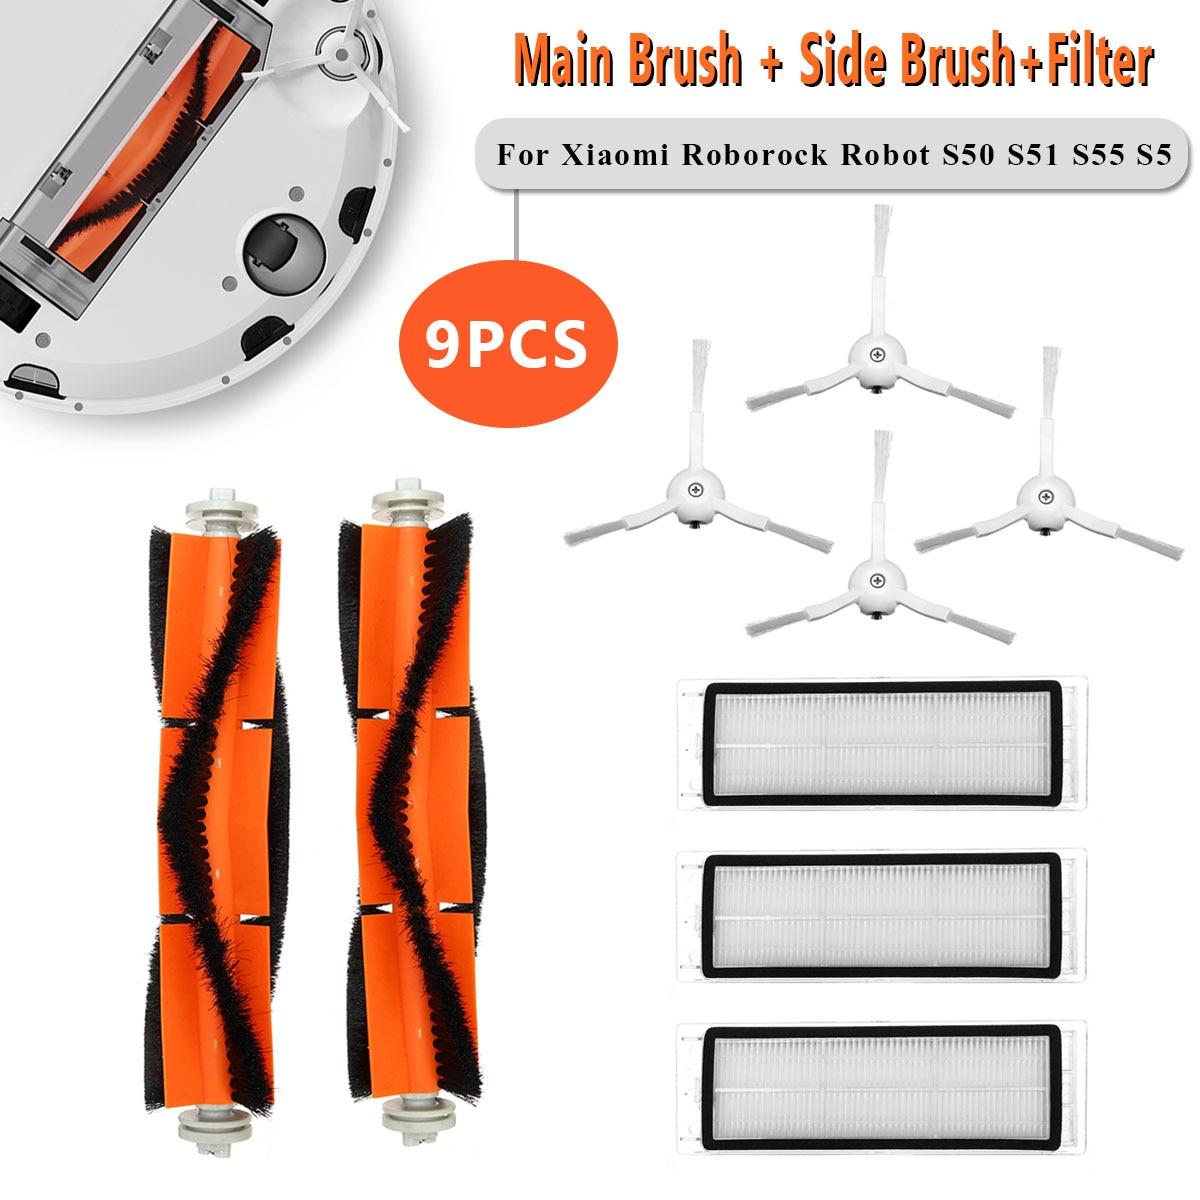 9 pçs peças de aspirador hepa filtro principal escova para xiaomi roborock s50 s51 s55 s5 robô aspirador acessórios